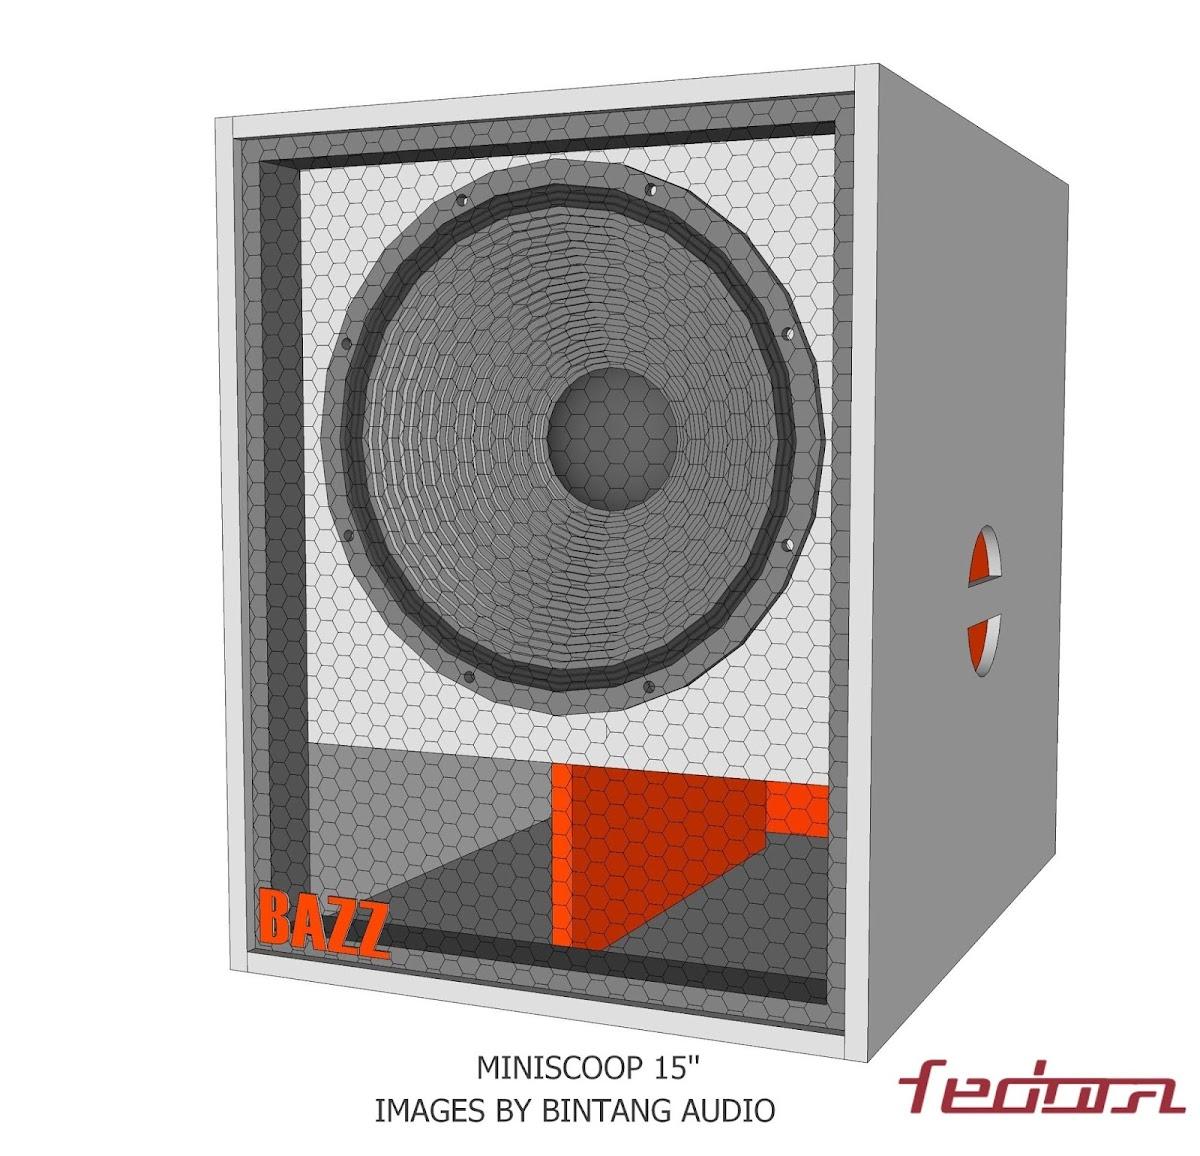 Tampak depan speaker Miniscoop 15 Inch